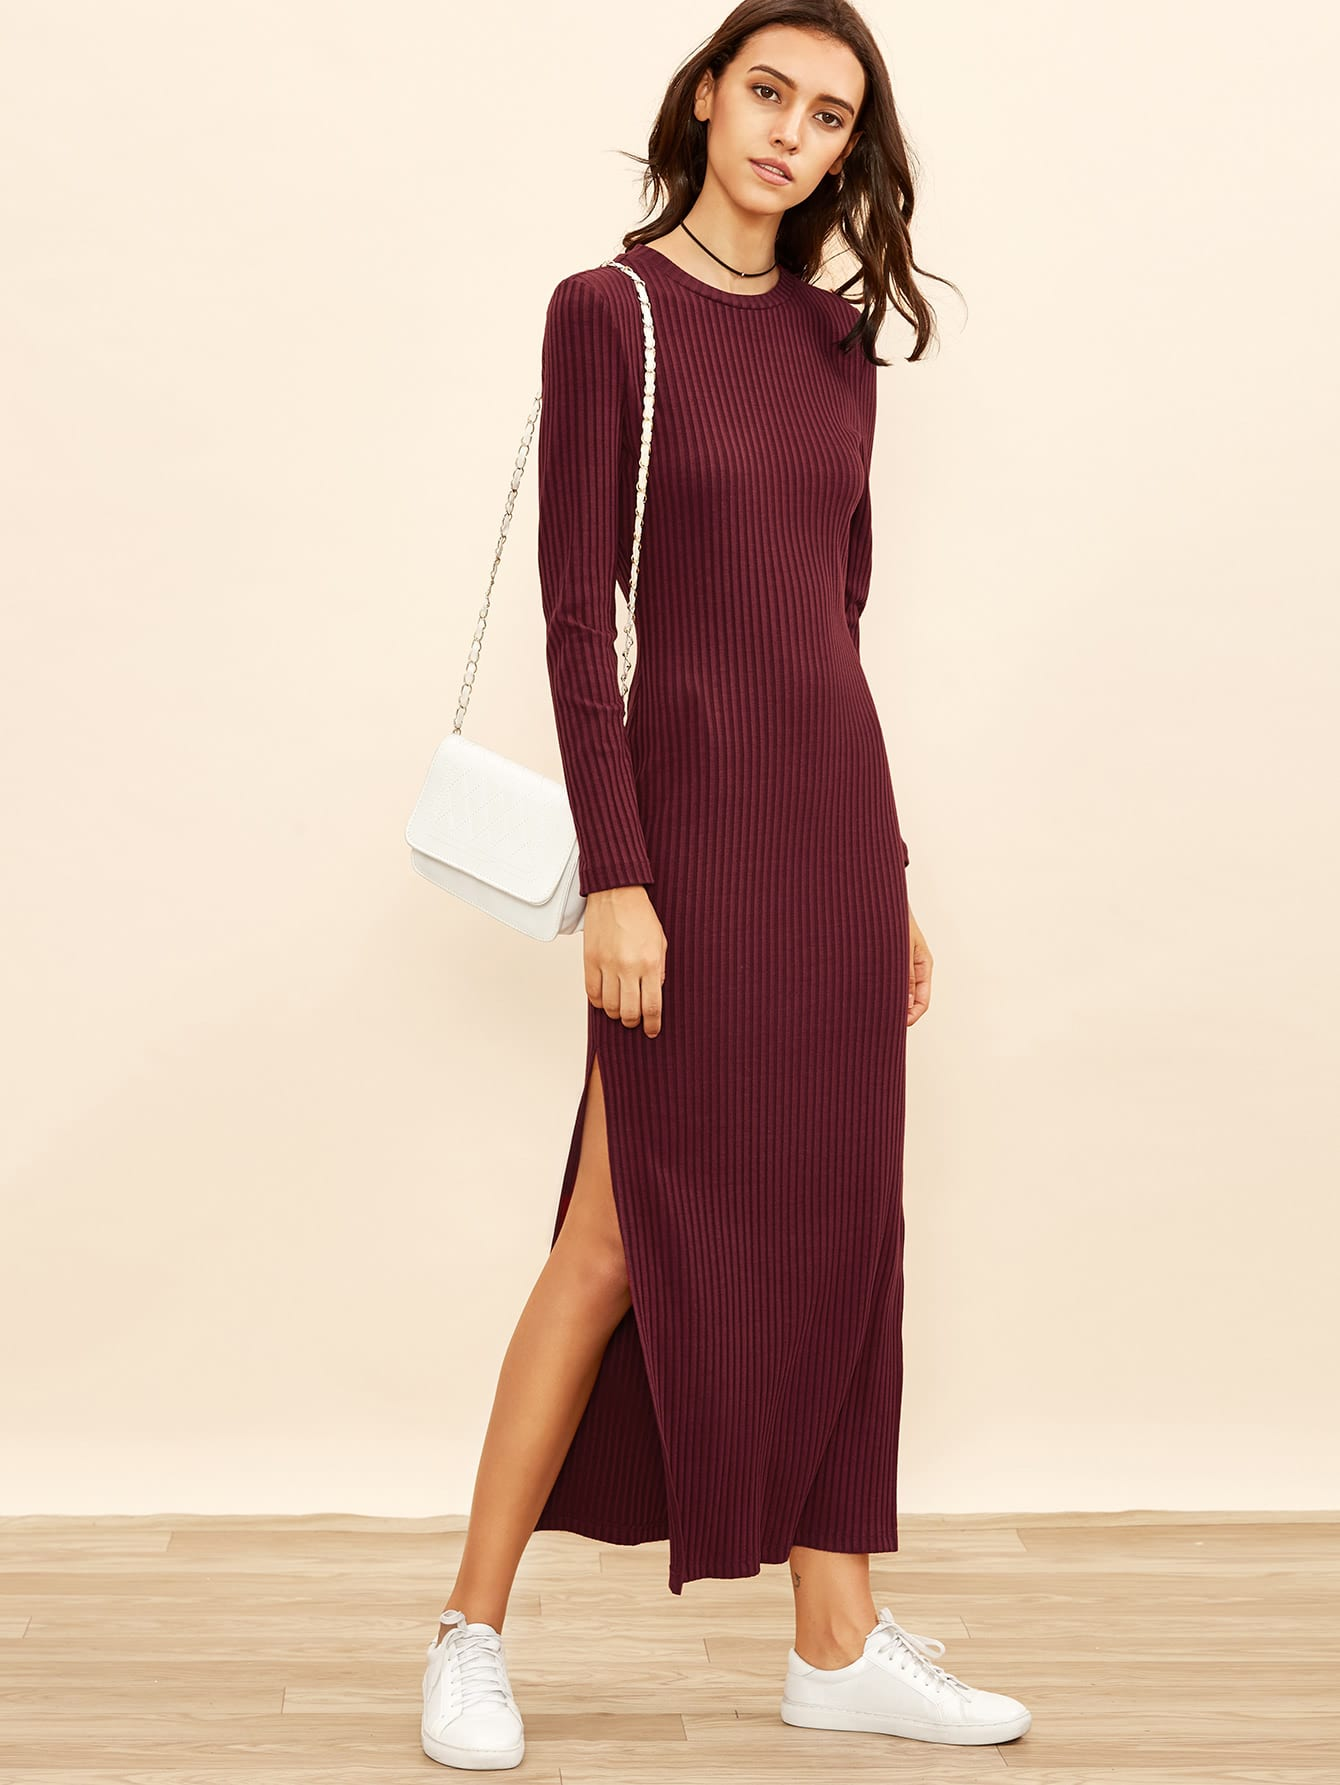 Burgundy Long Sleeve High Slit Ribbed Dress dress160913706